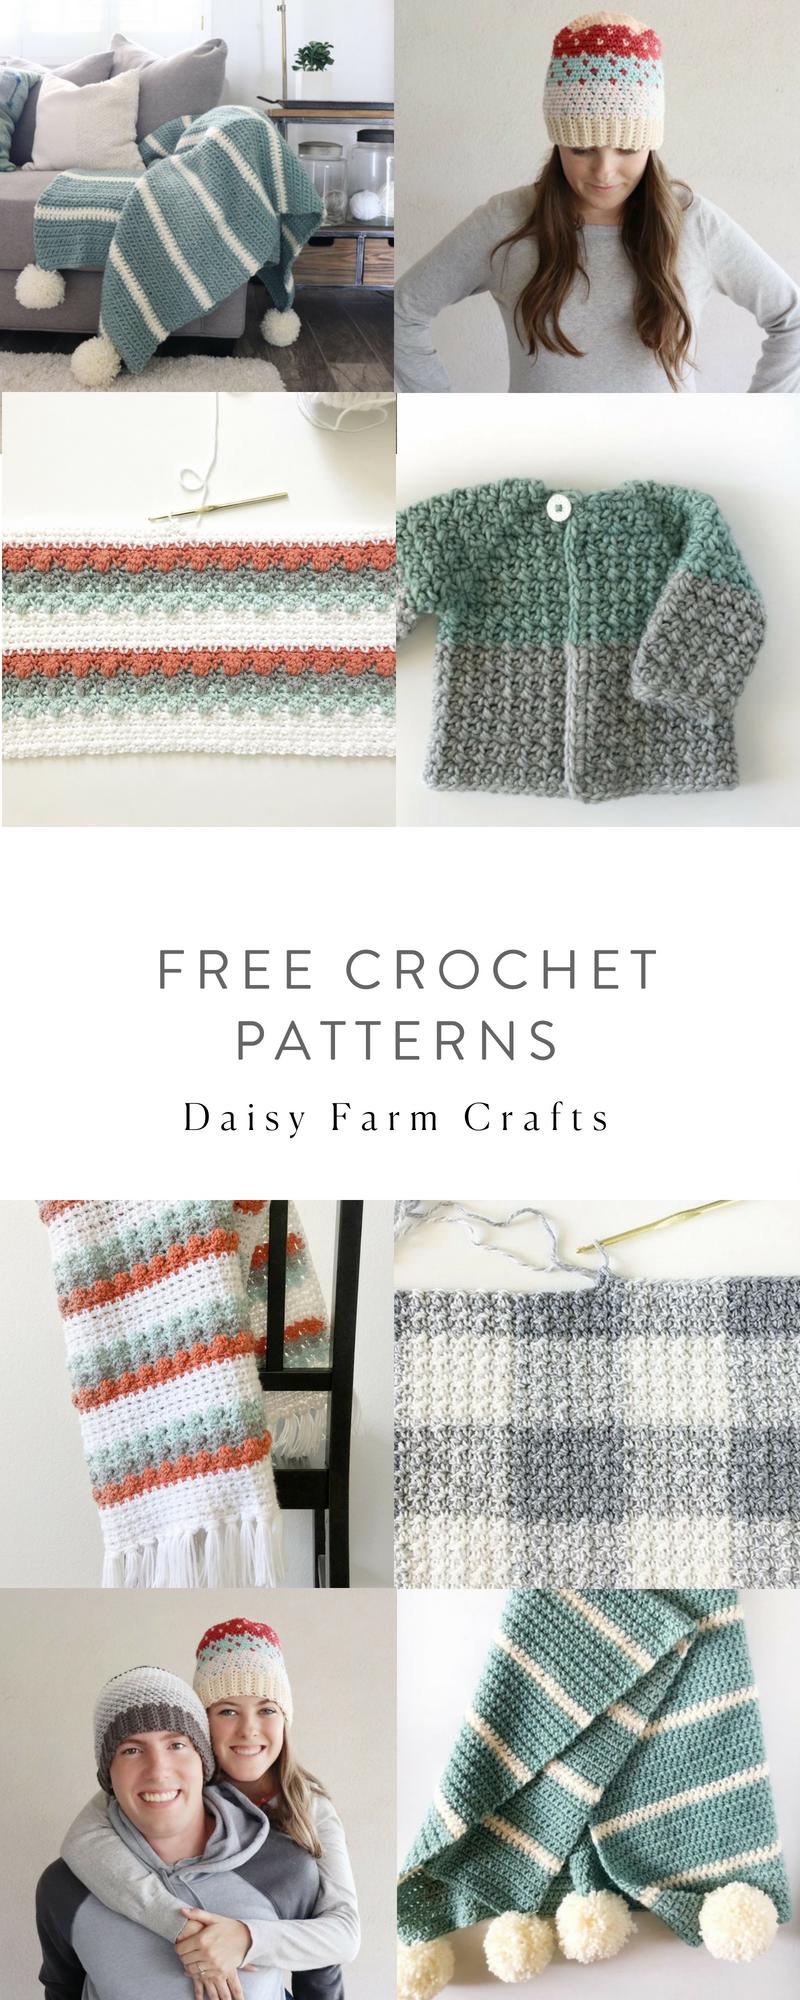 Free Crochet Patterns - Daisy Farm Crafts | BEBES | Pinterest | Bebe